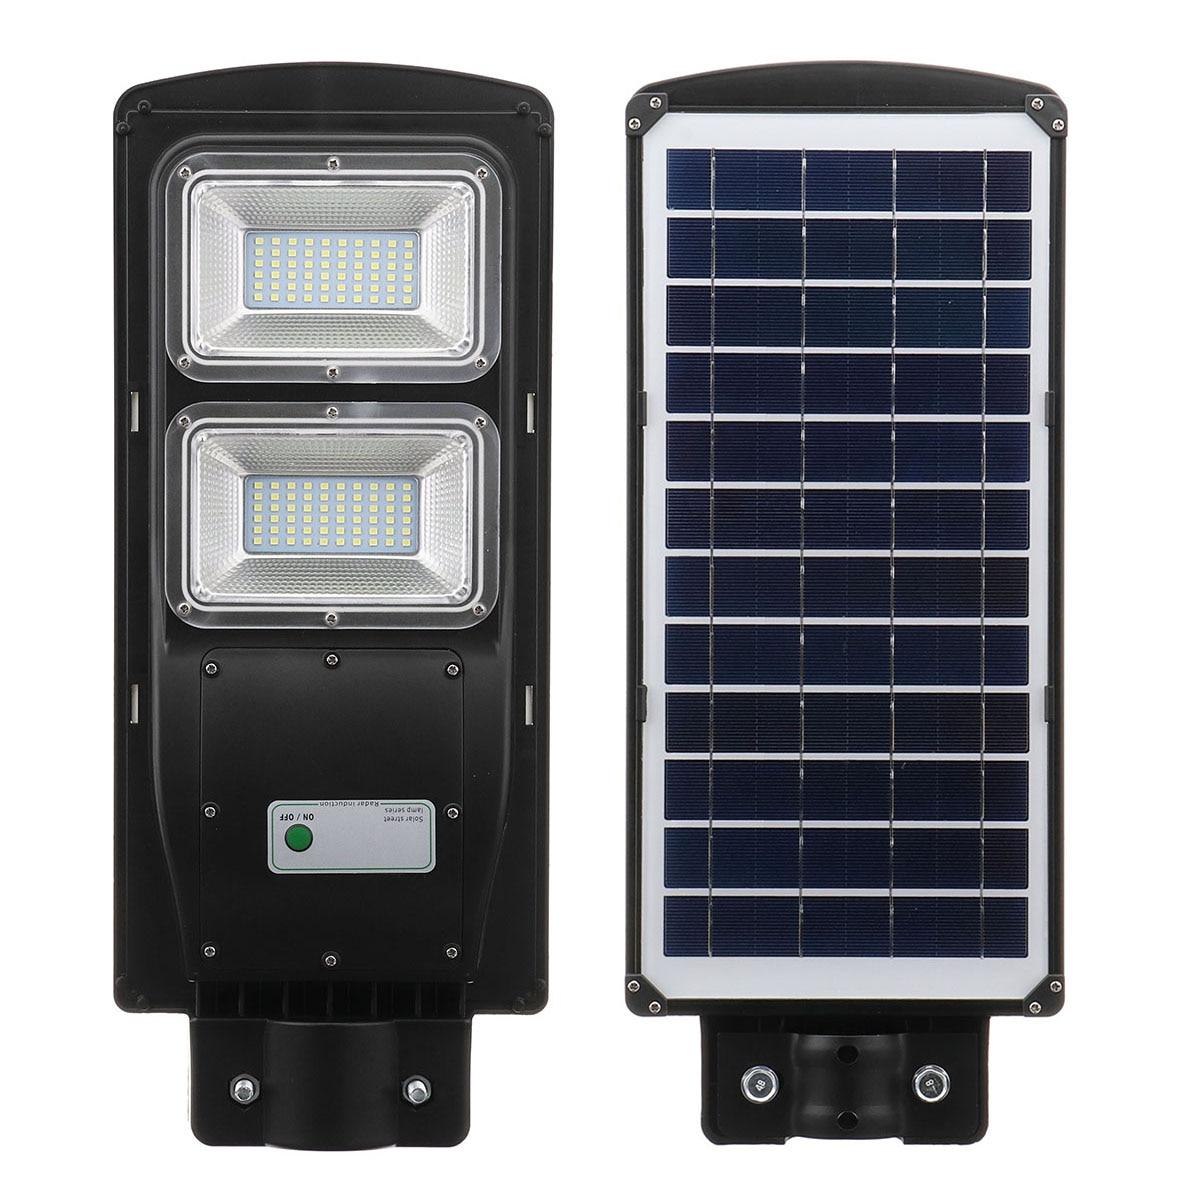 60W LED IP67 Solar Street Light Radar with PIR Motion Sensor Outdoor Lighting Wall Lamps Solar Landscape Garden Lights